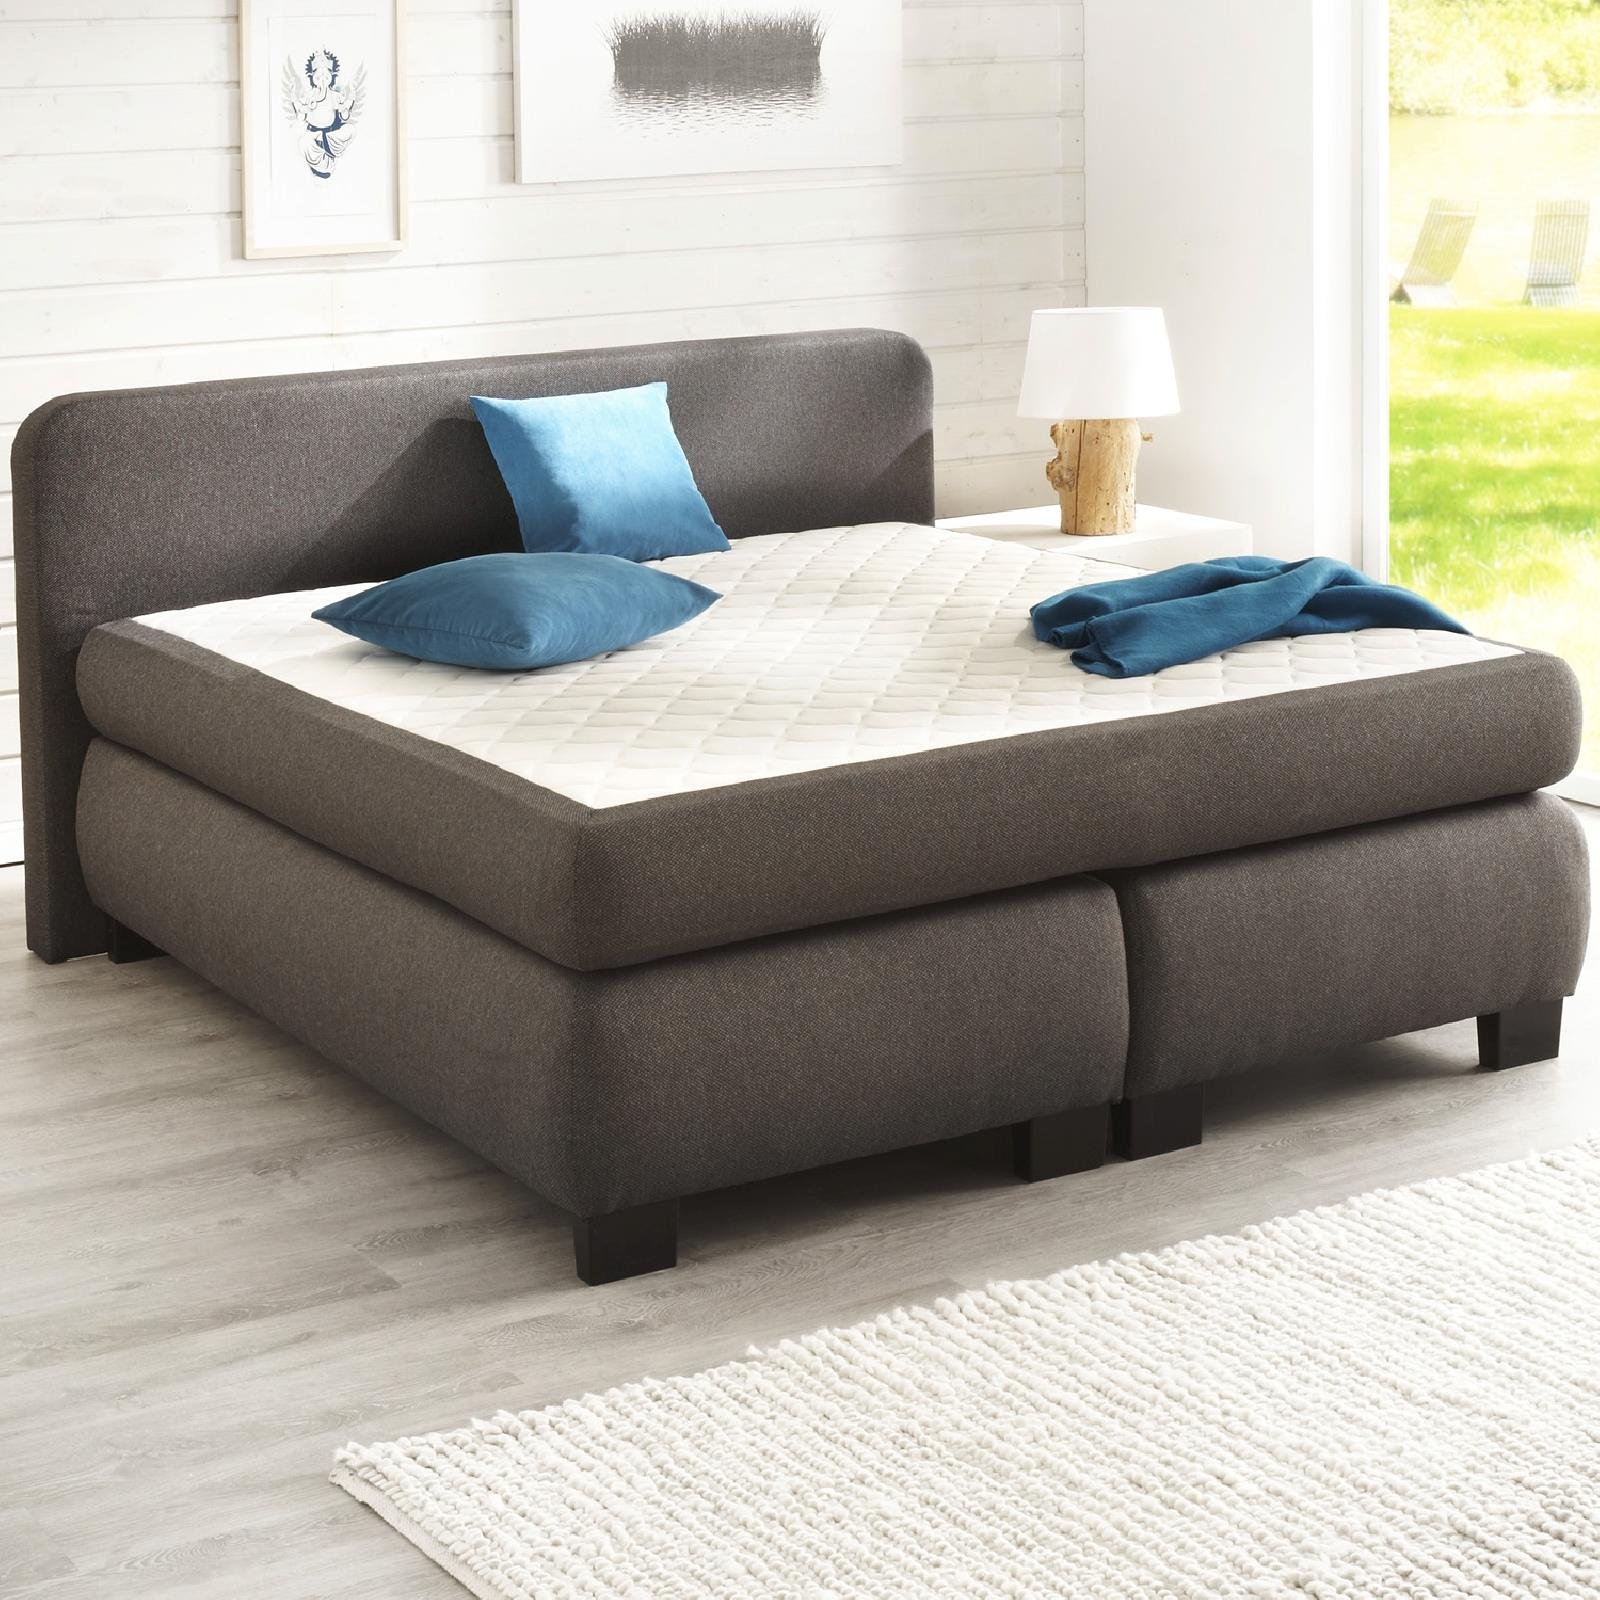 boxspringbett set lars mit matratze lederoptik caro m bel. Black Bedroom Furniture Sets. Home Design Ideas